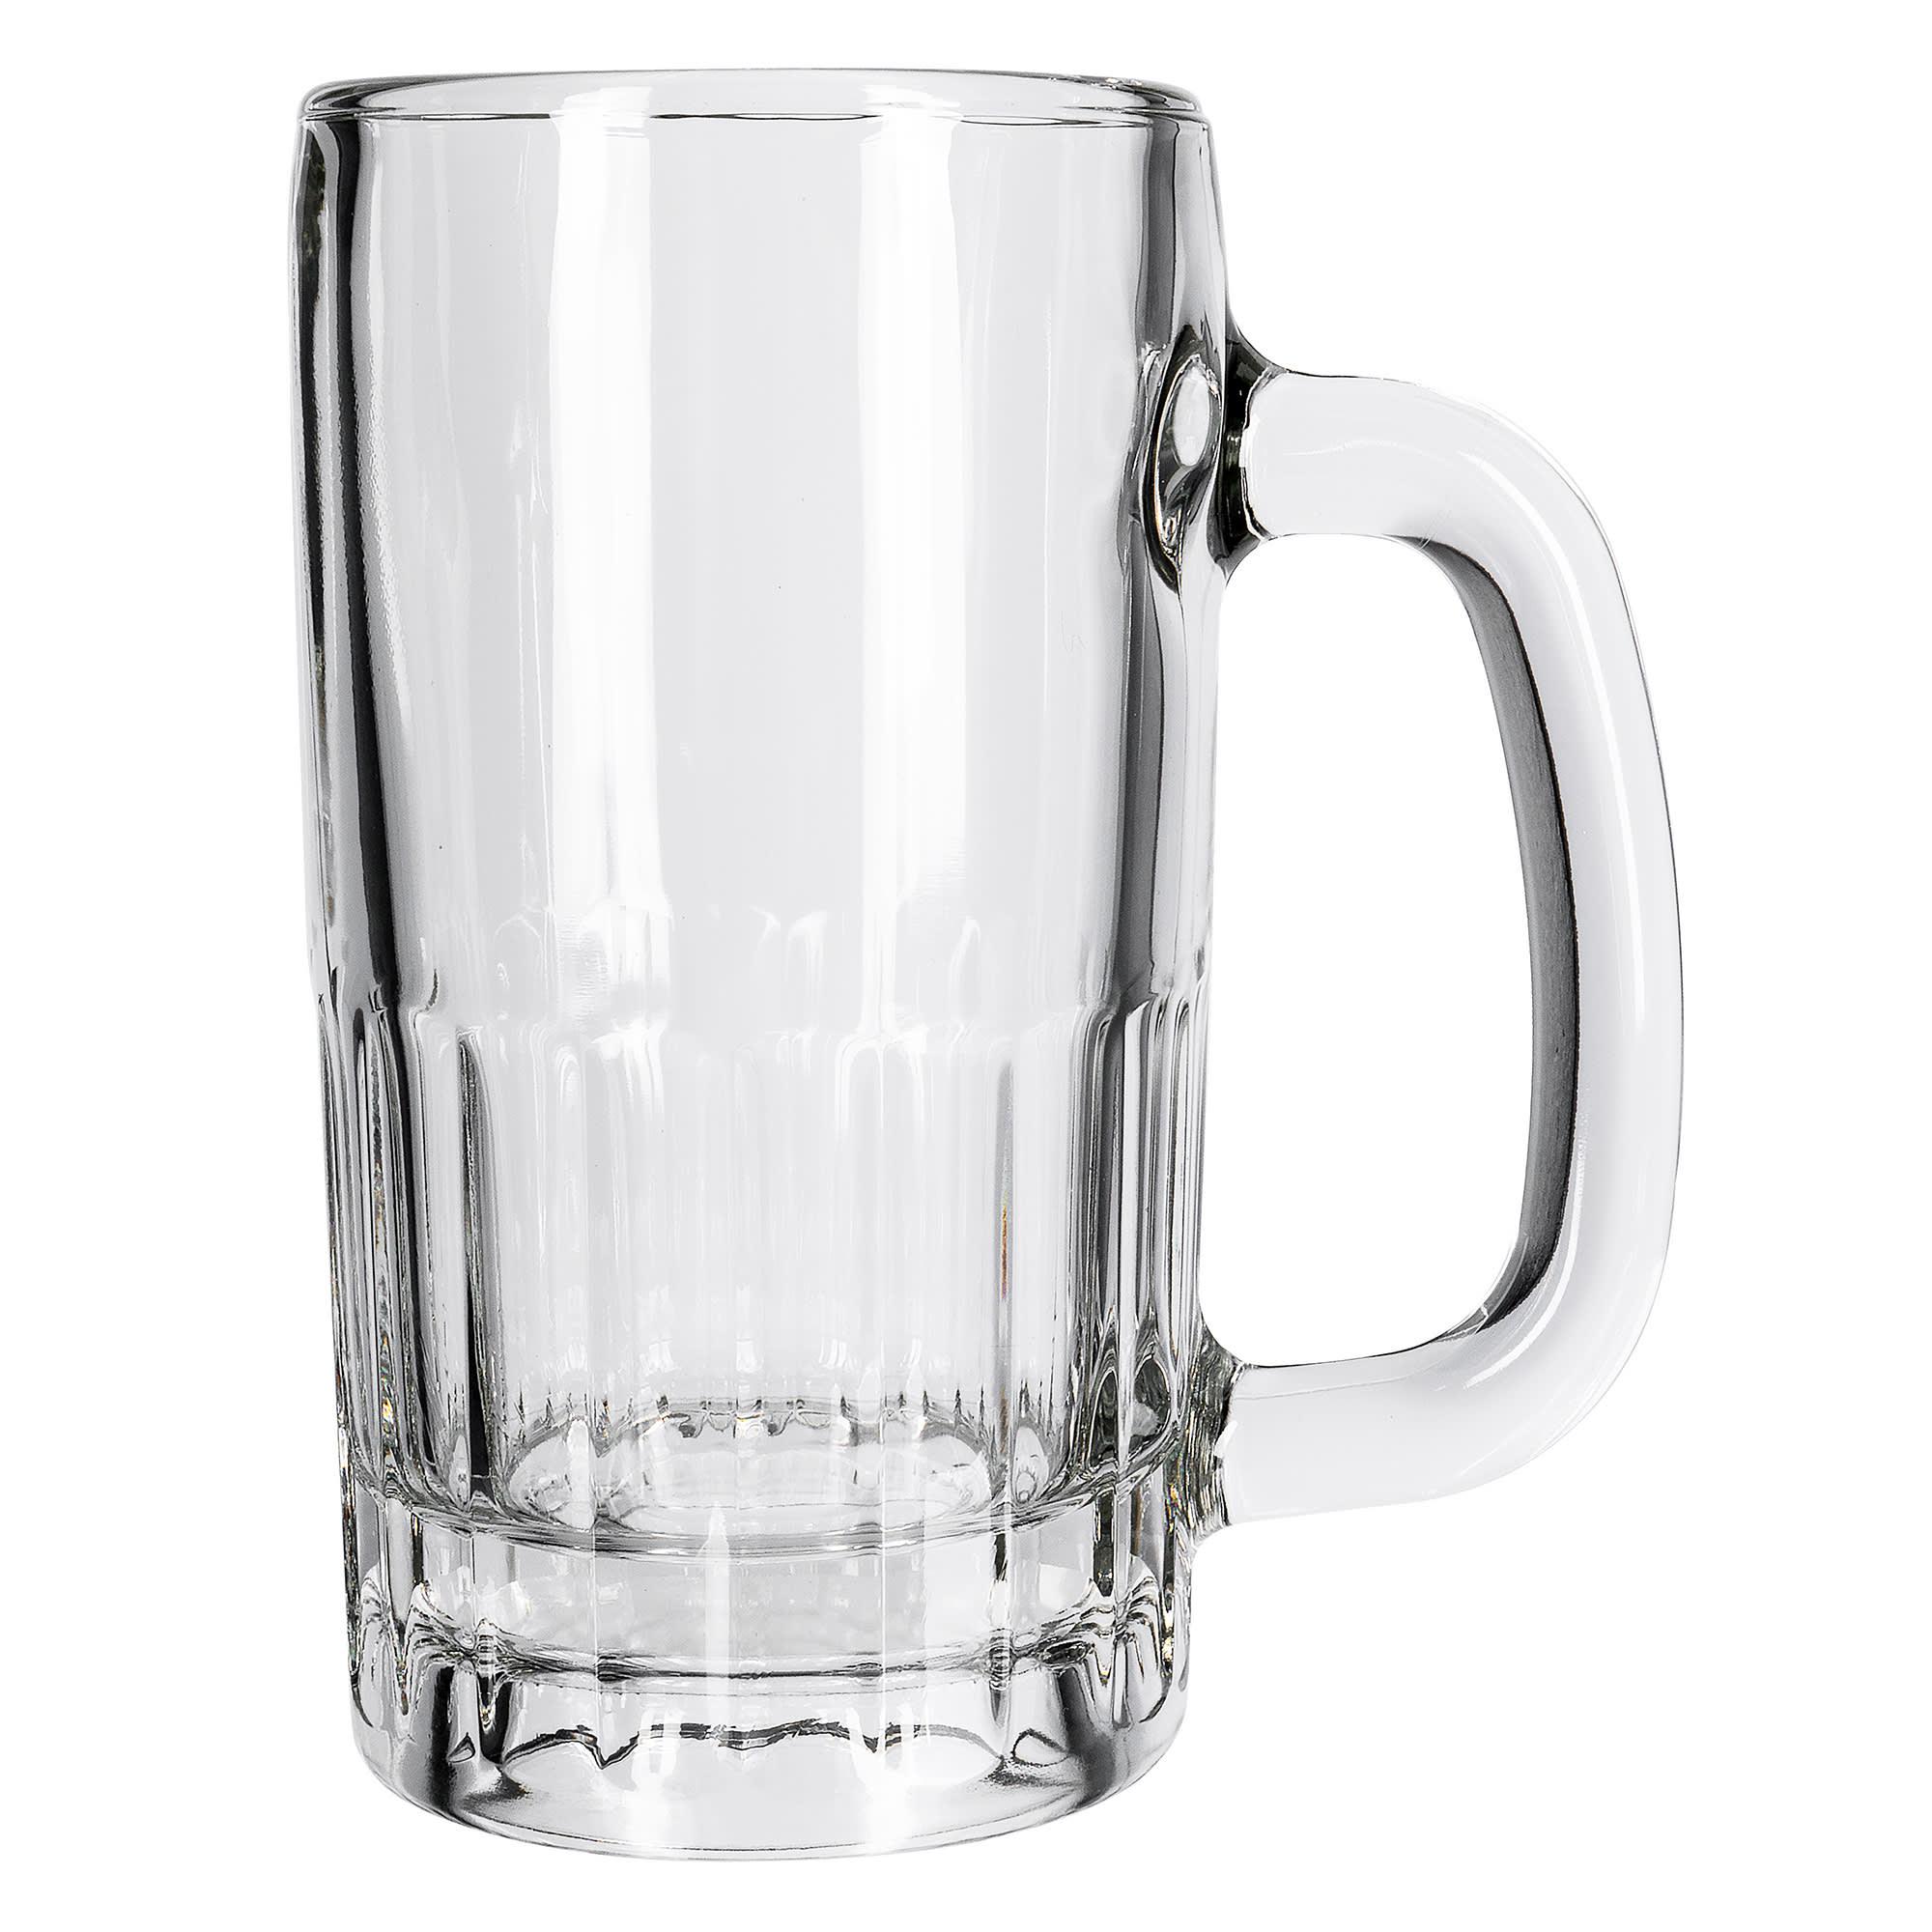 Libbey 5309 12 oz Mug - Handle